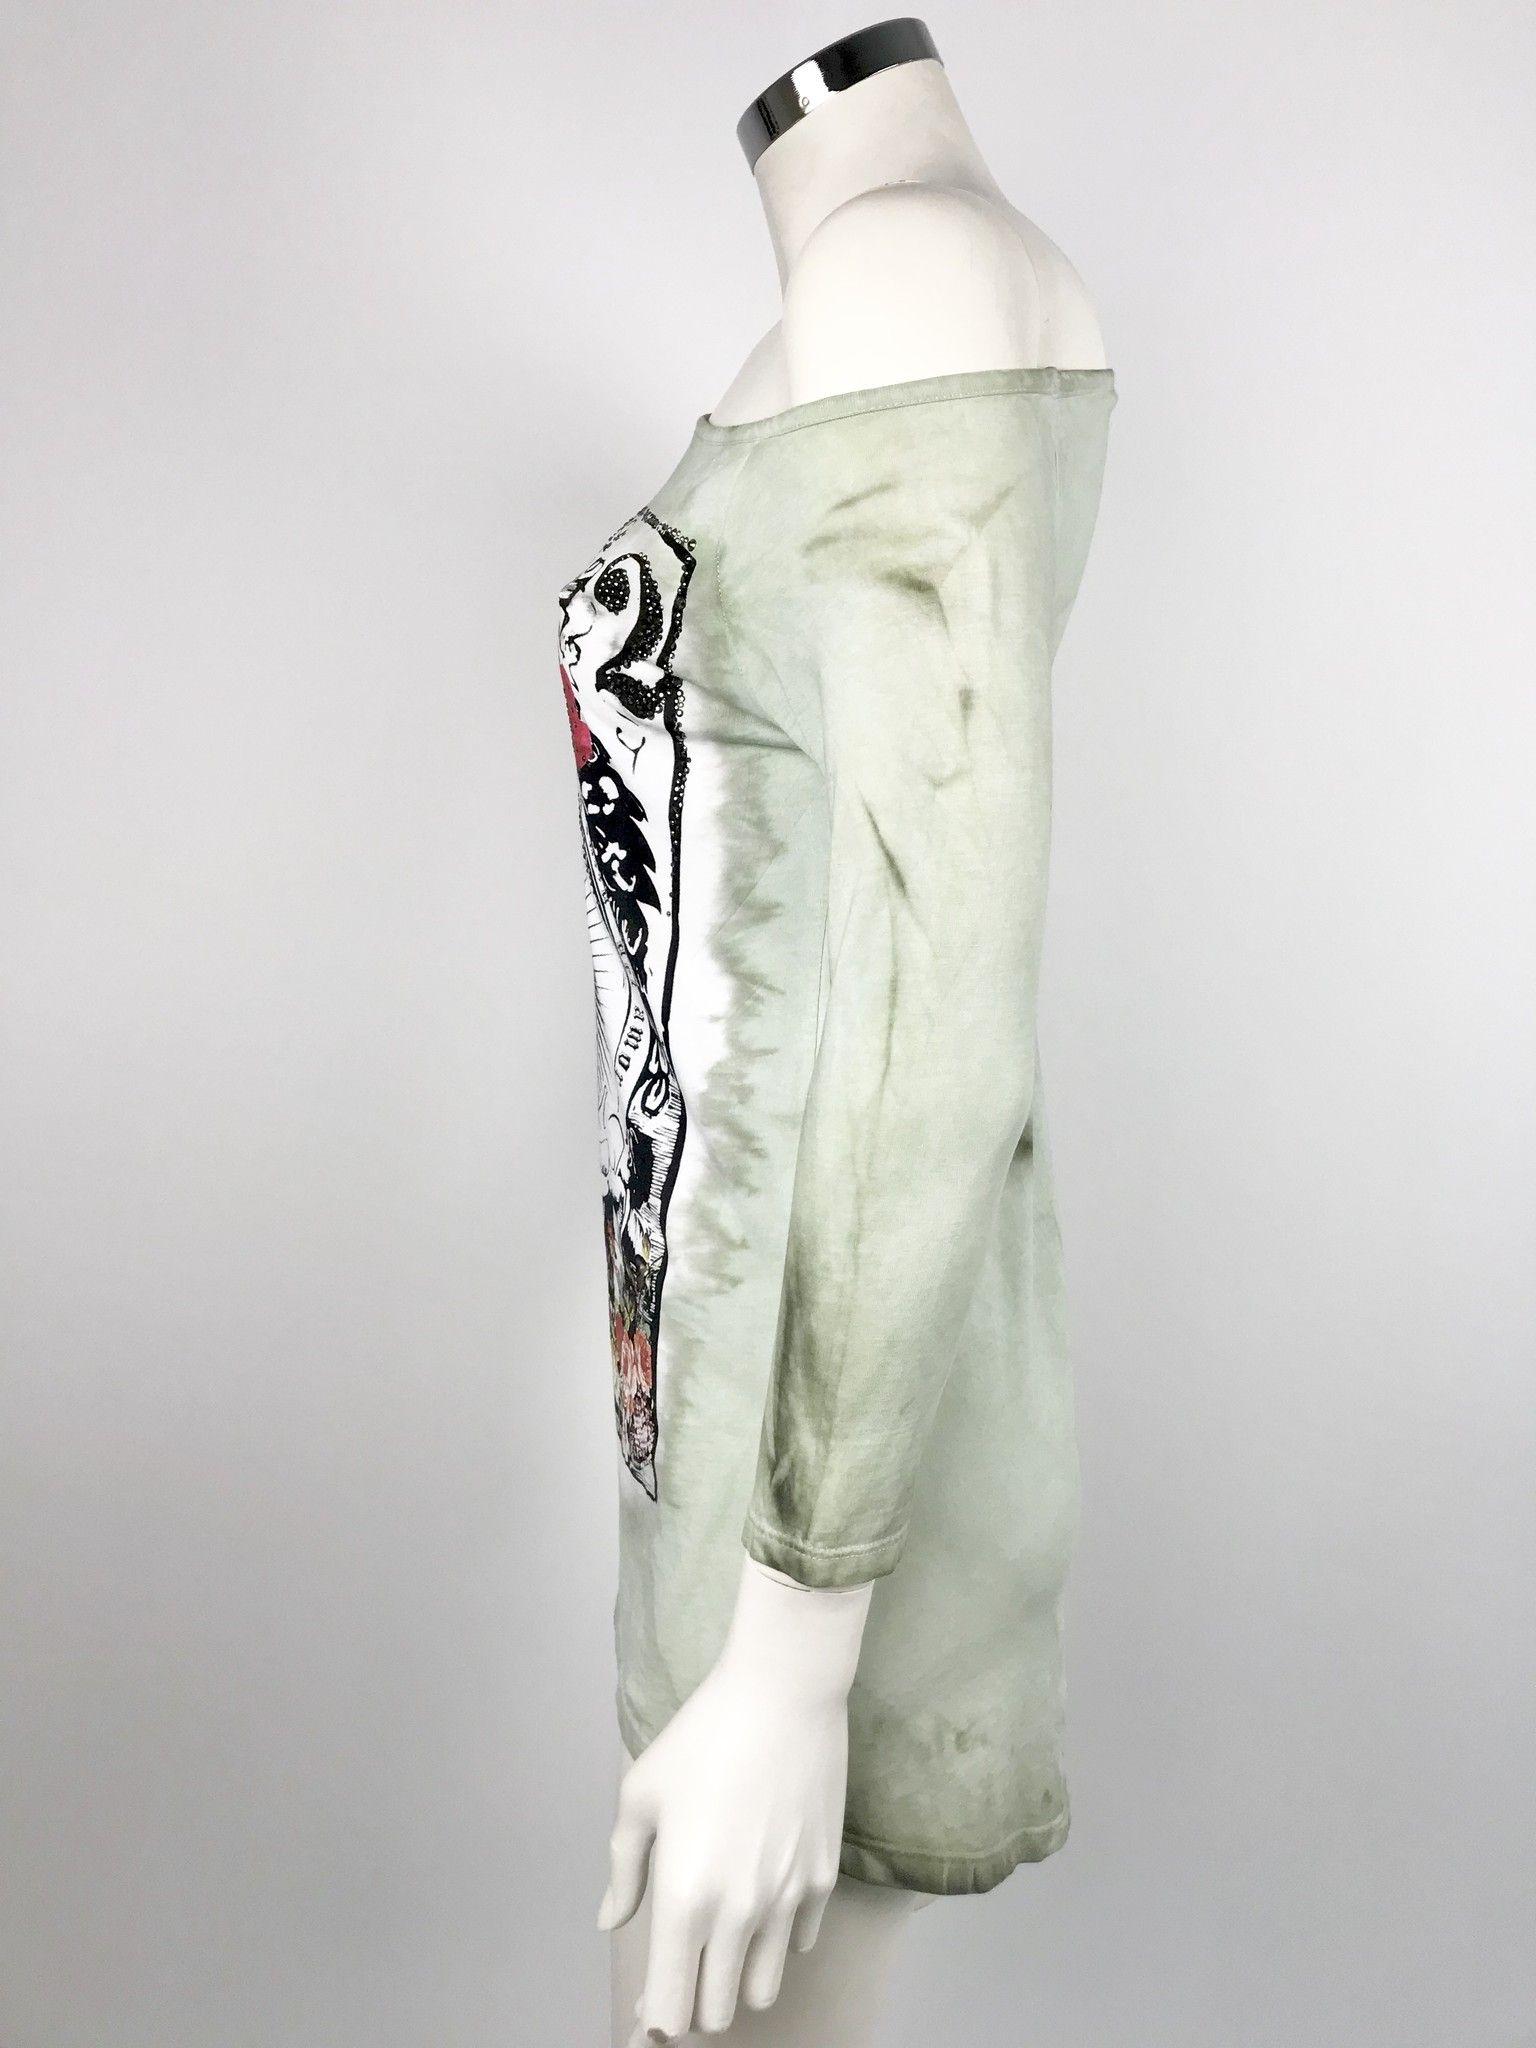 Sexy Woman Printed T-shirt Swarovski Cod.6054